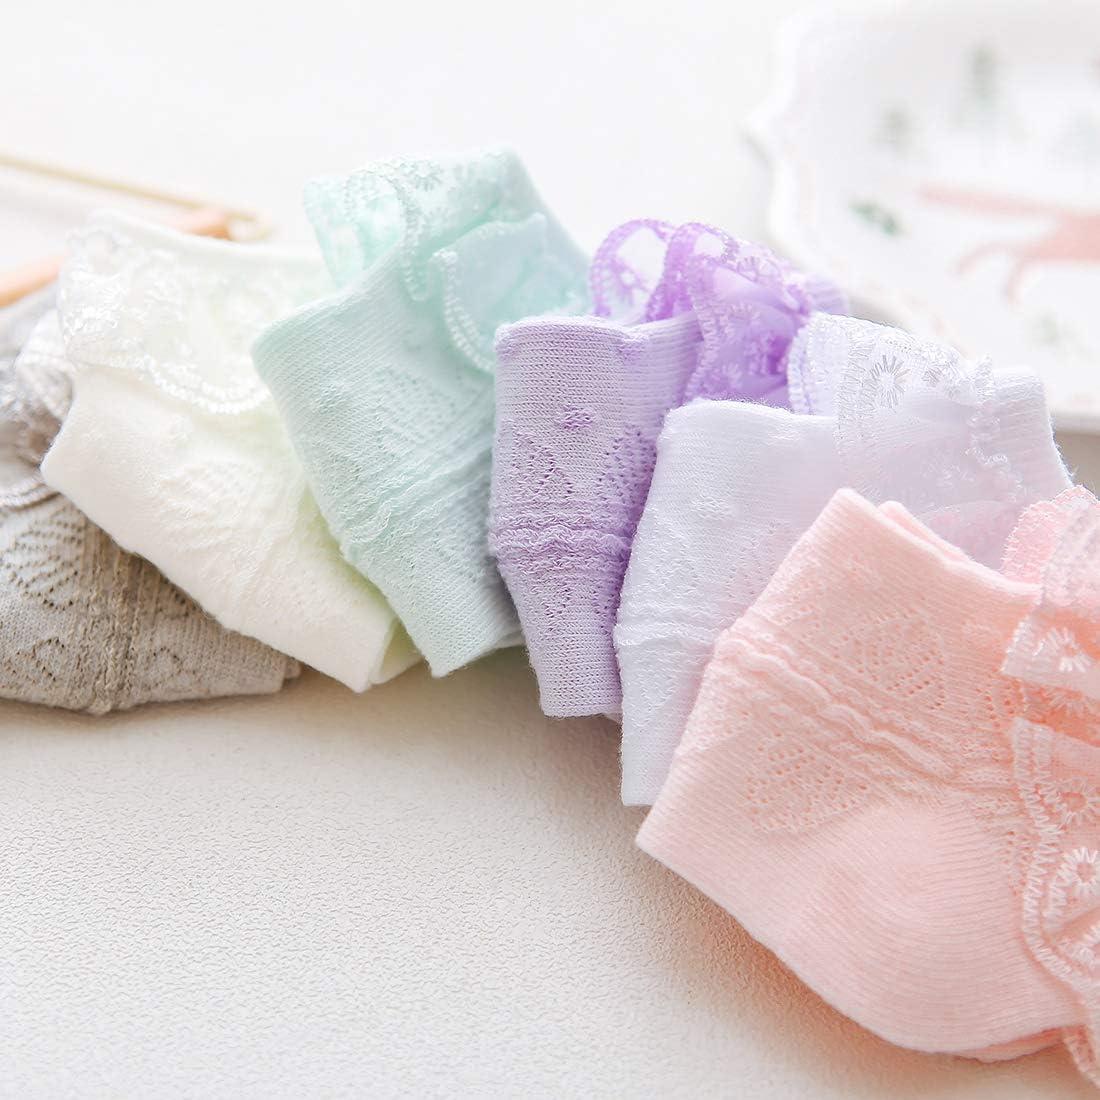 Baby Girl Socks Newborn Infant Ruffle Lace Sock Cute Soft Dress Socks Toddler Socks